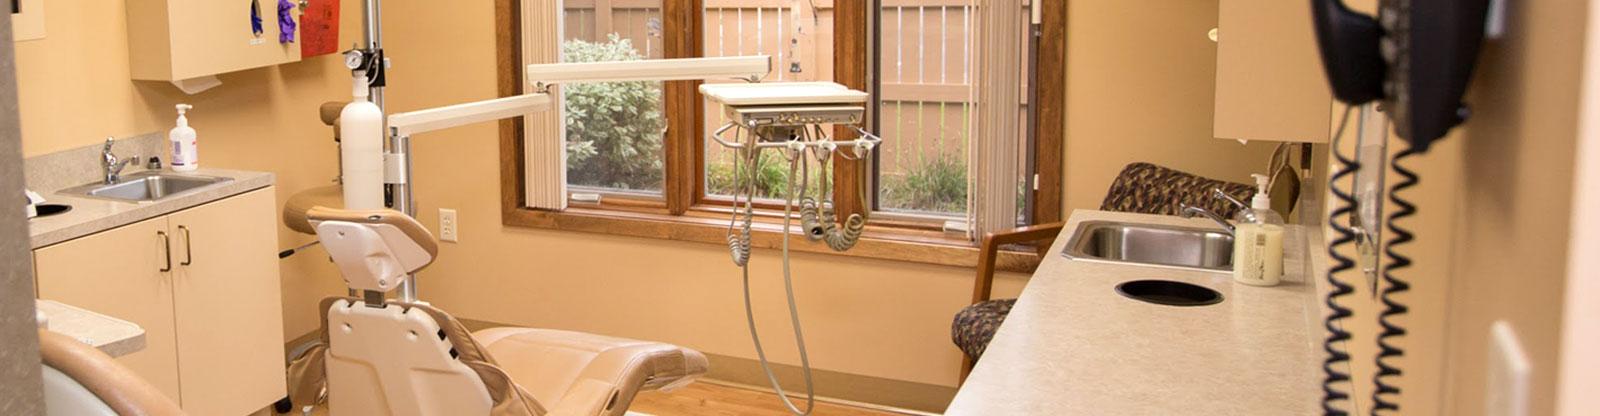 dentist reviews & testimonials